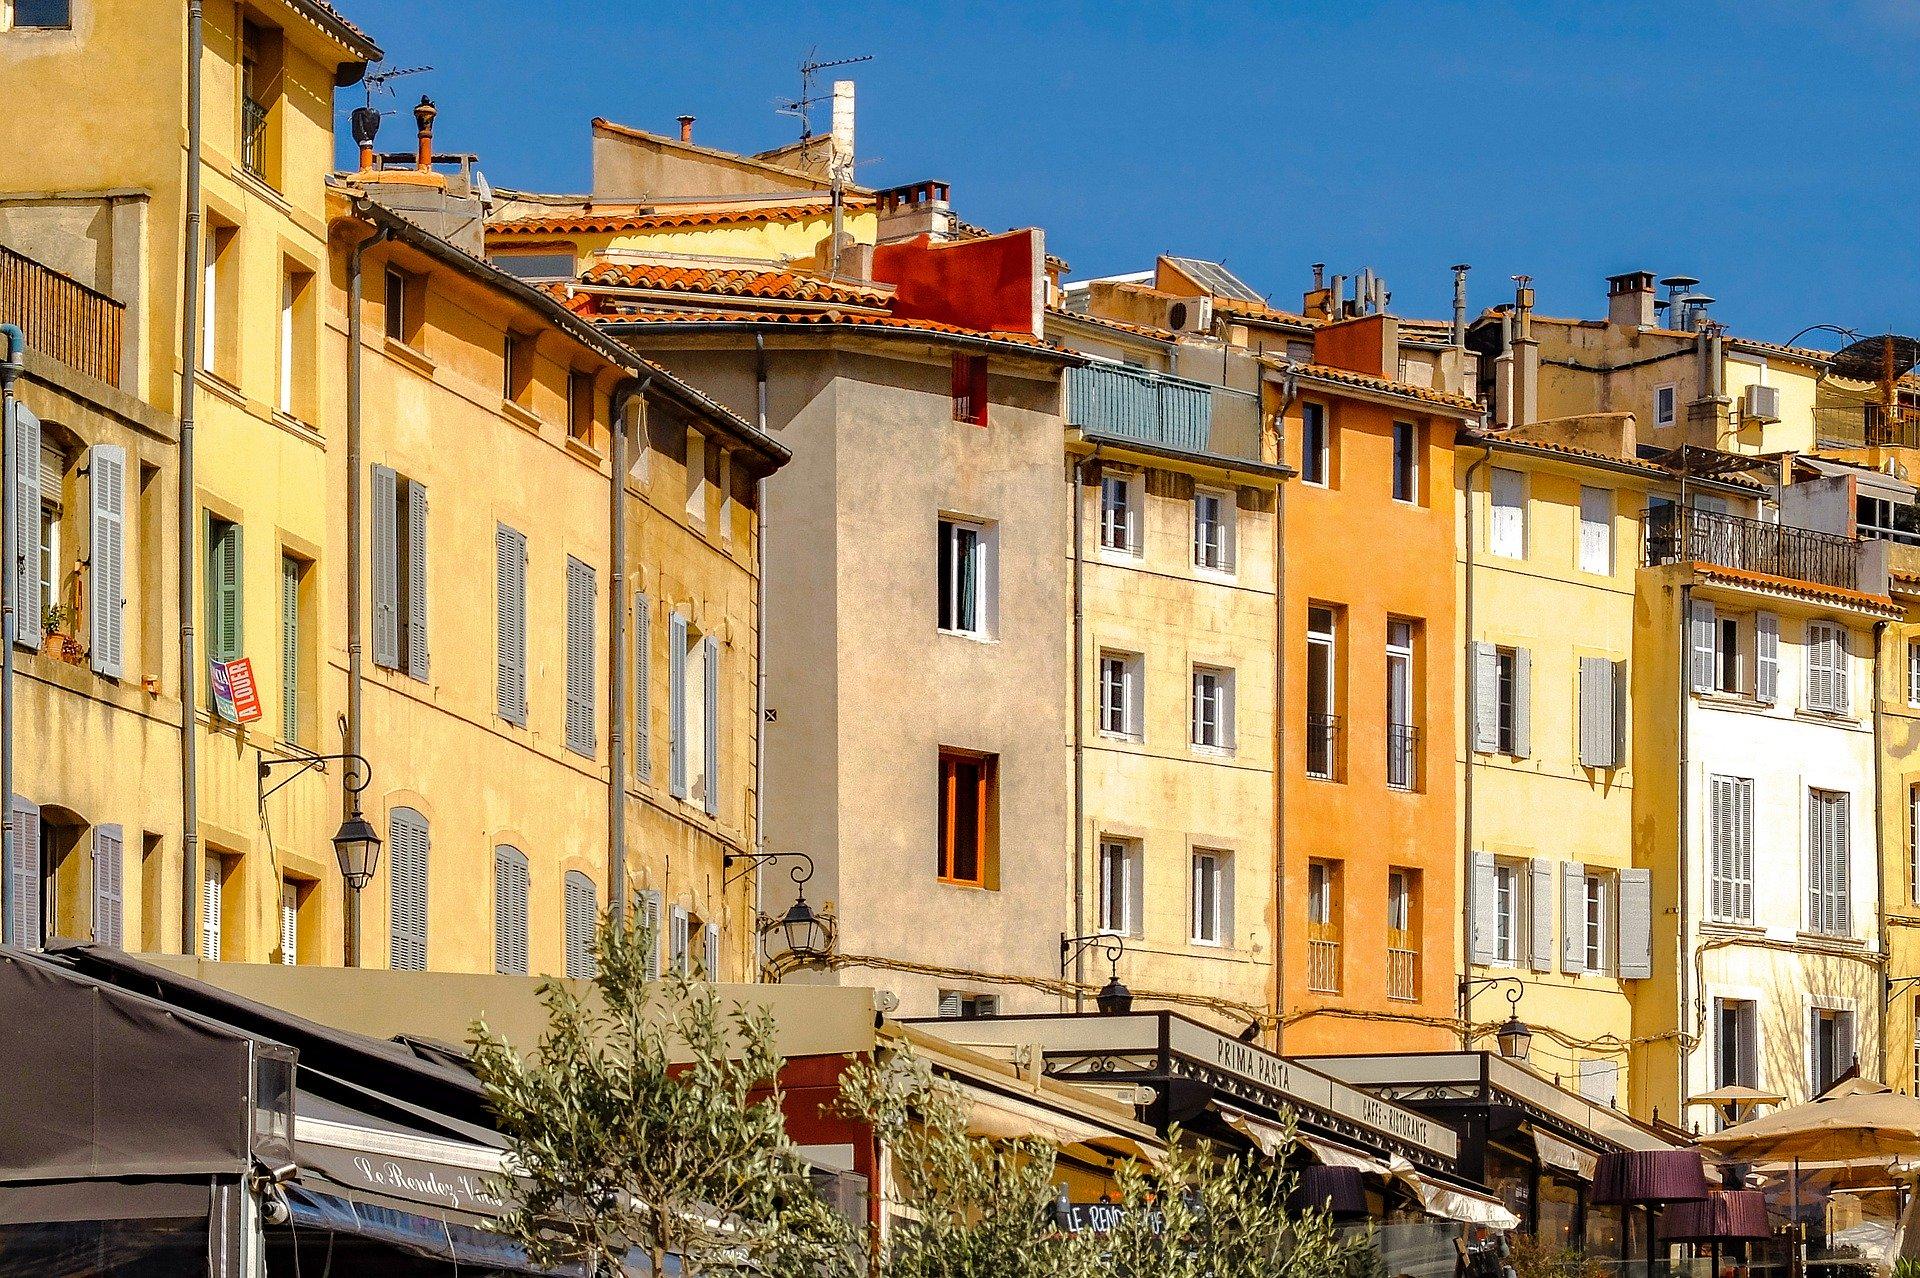 Achat immobilier en France